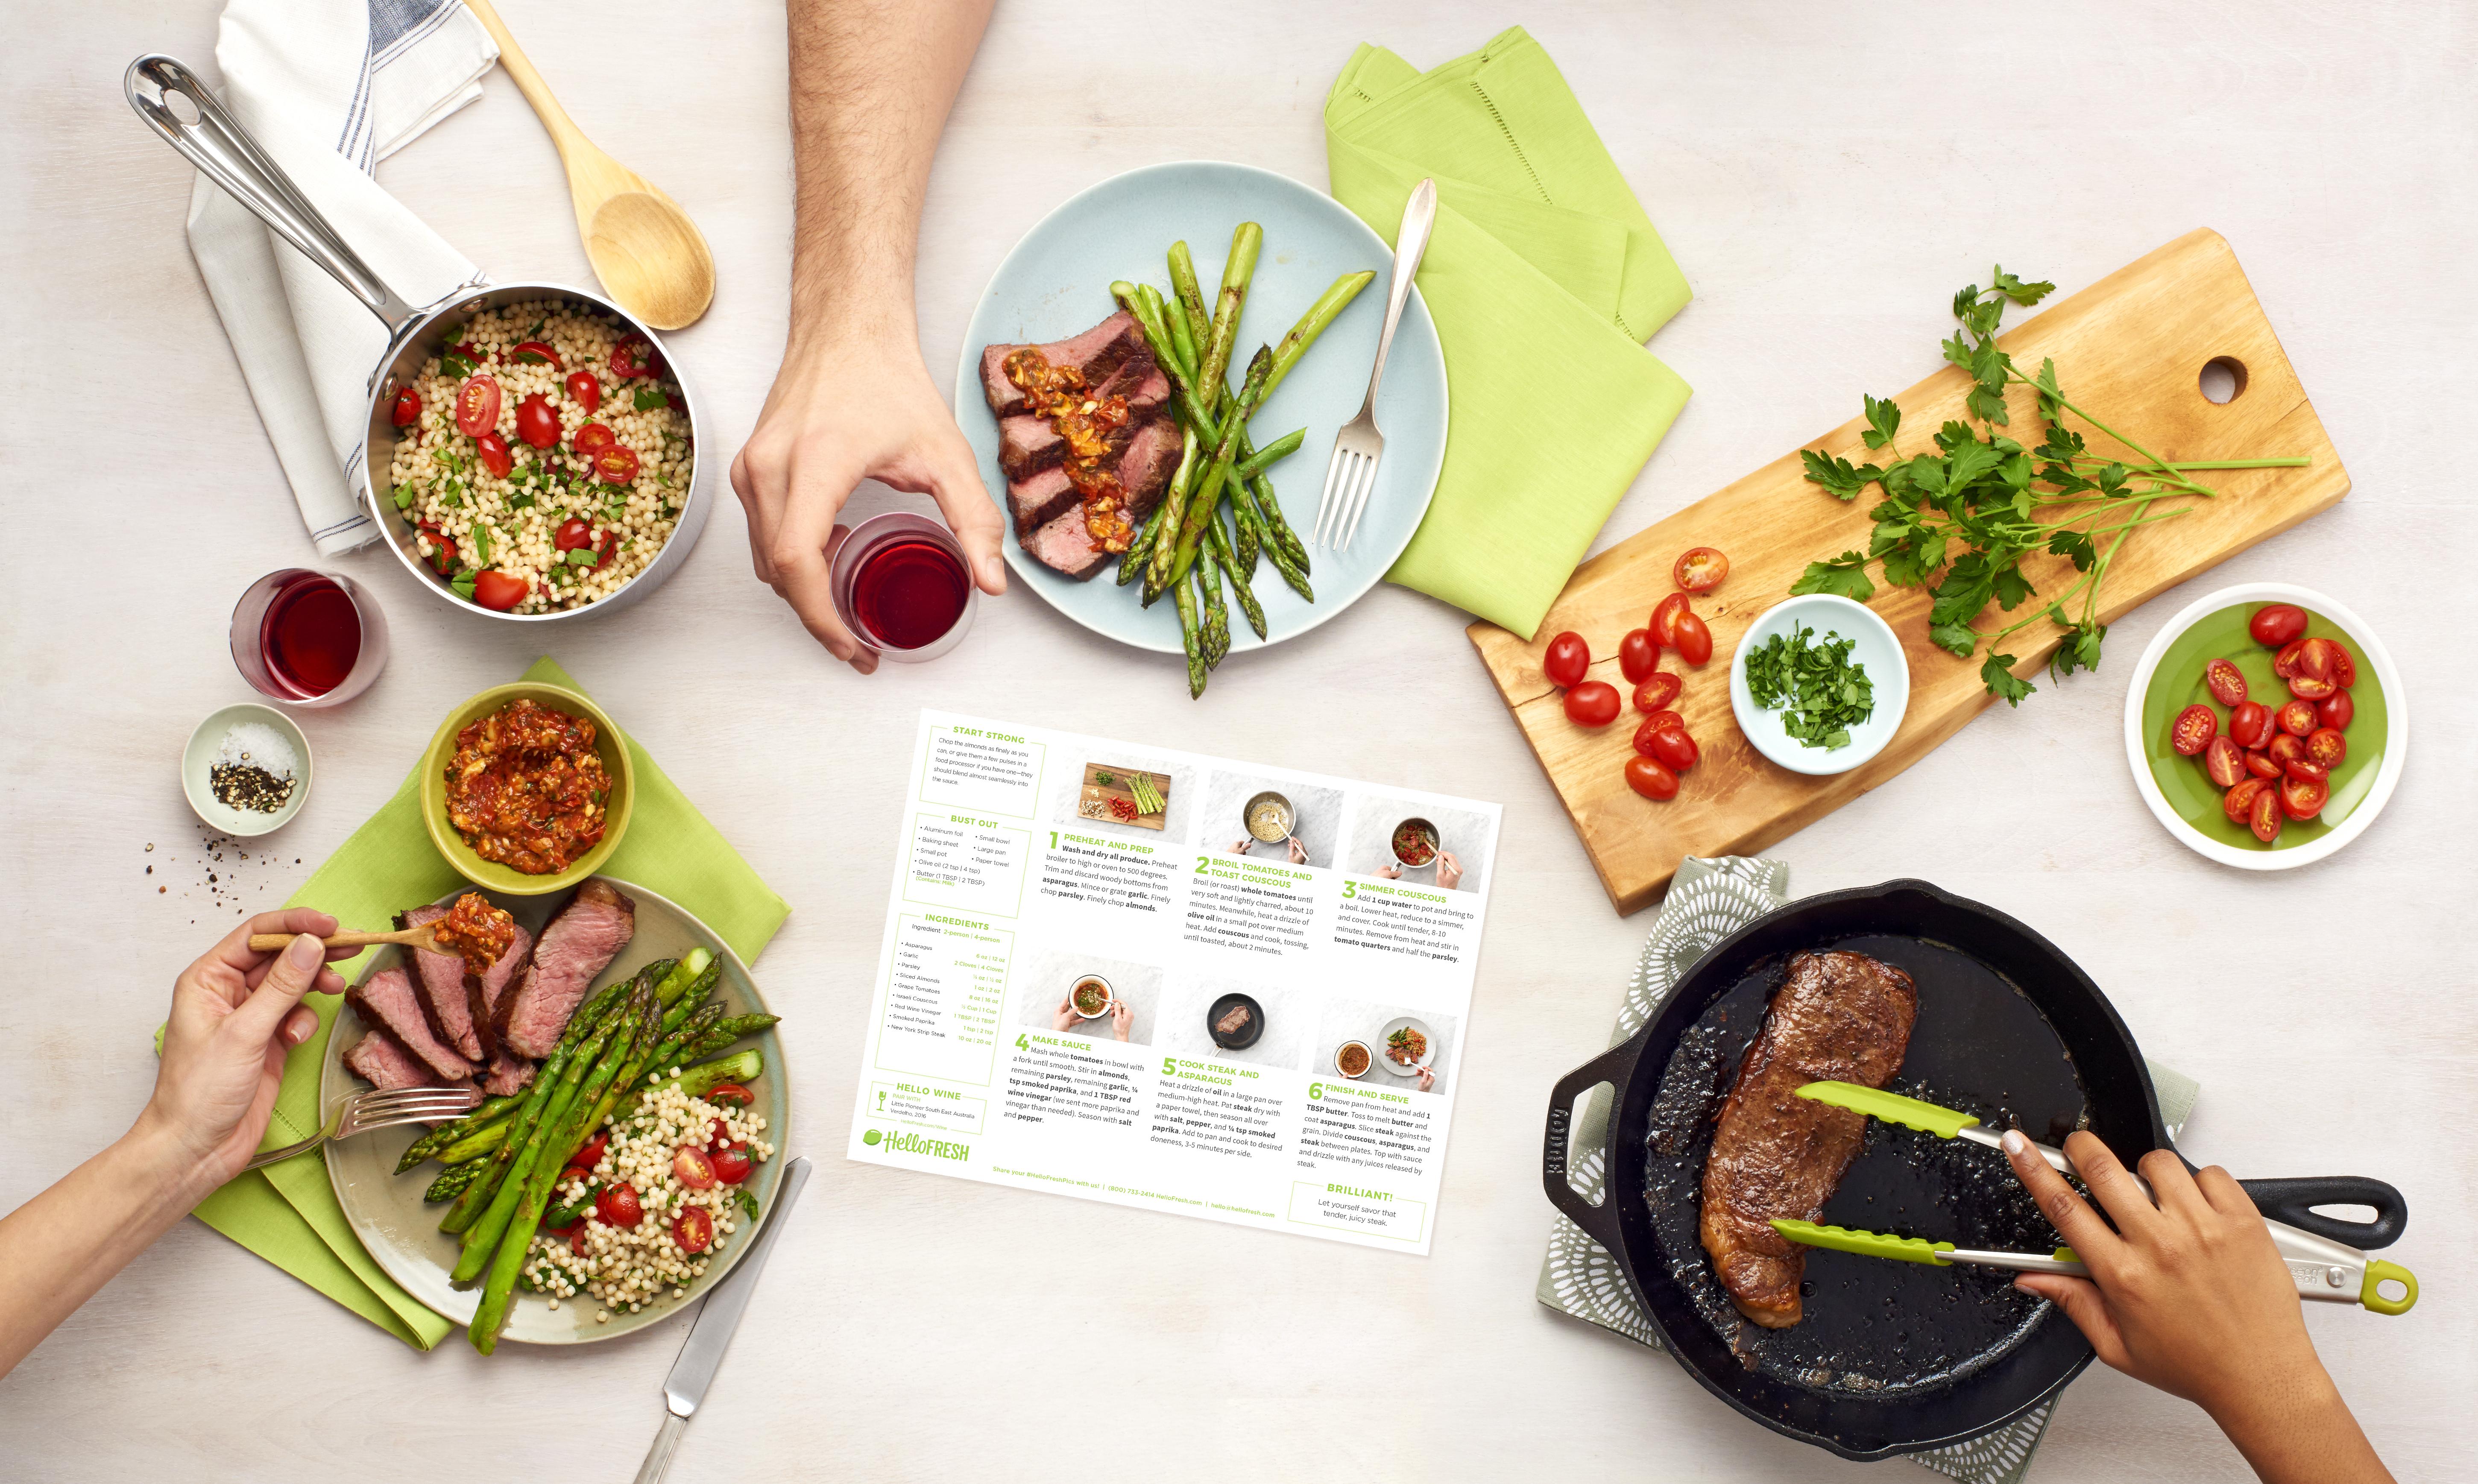 HF_Premium_Steak_Asparagus_Couscous_FullImage